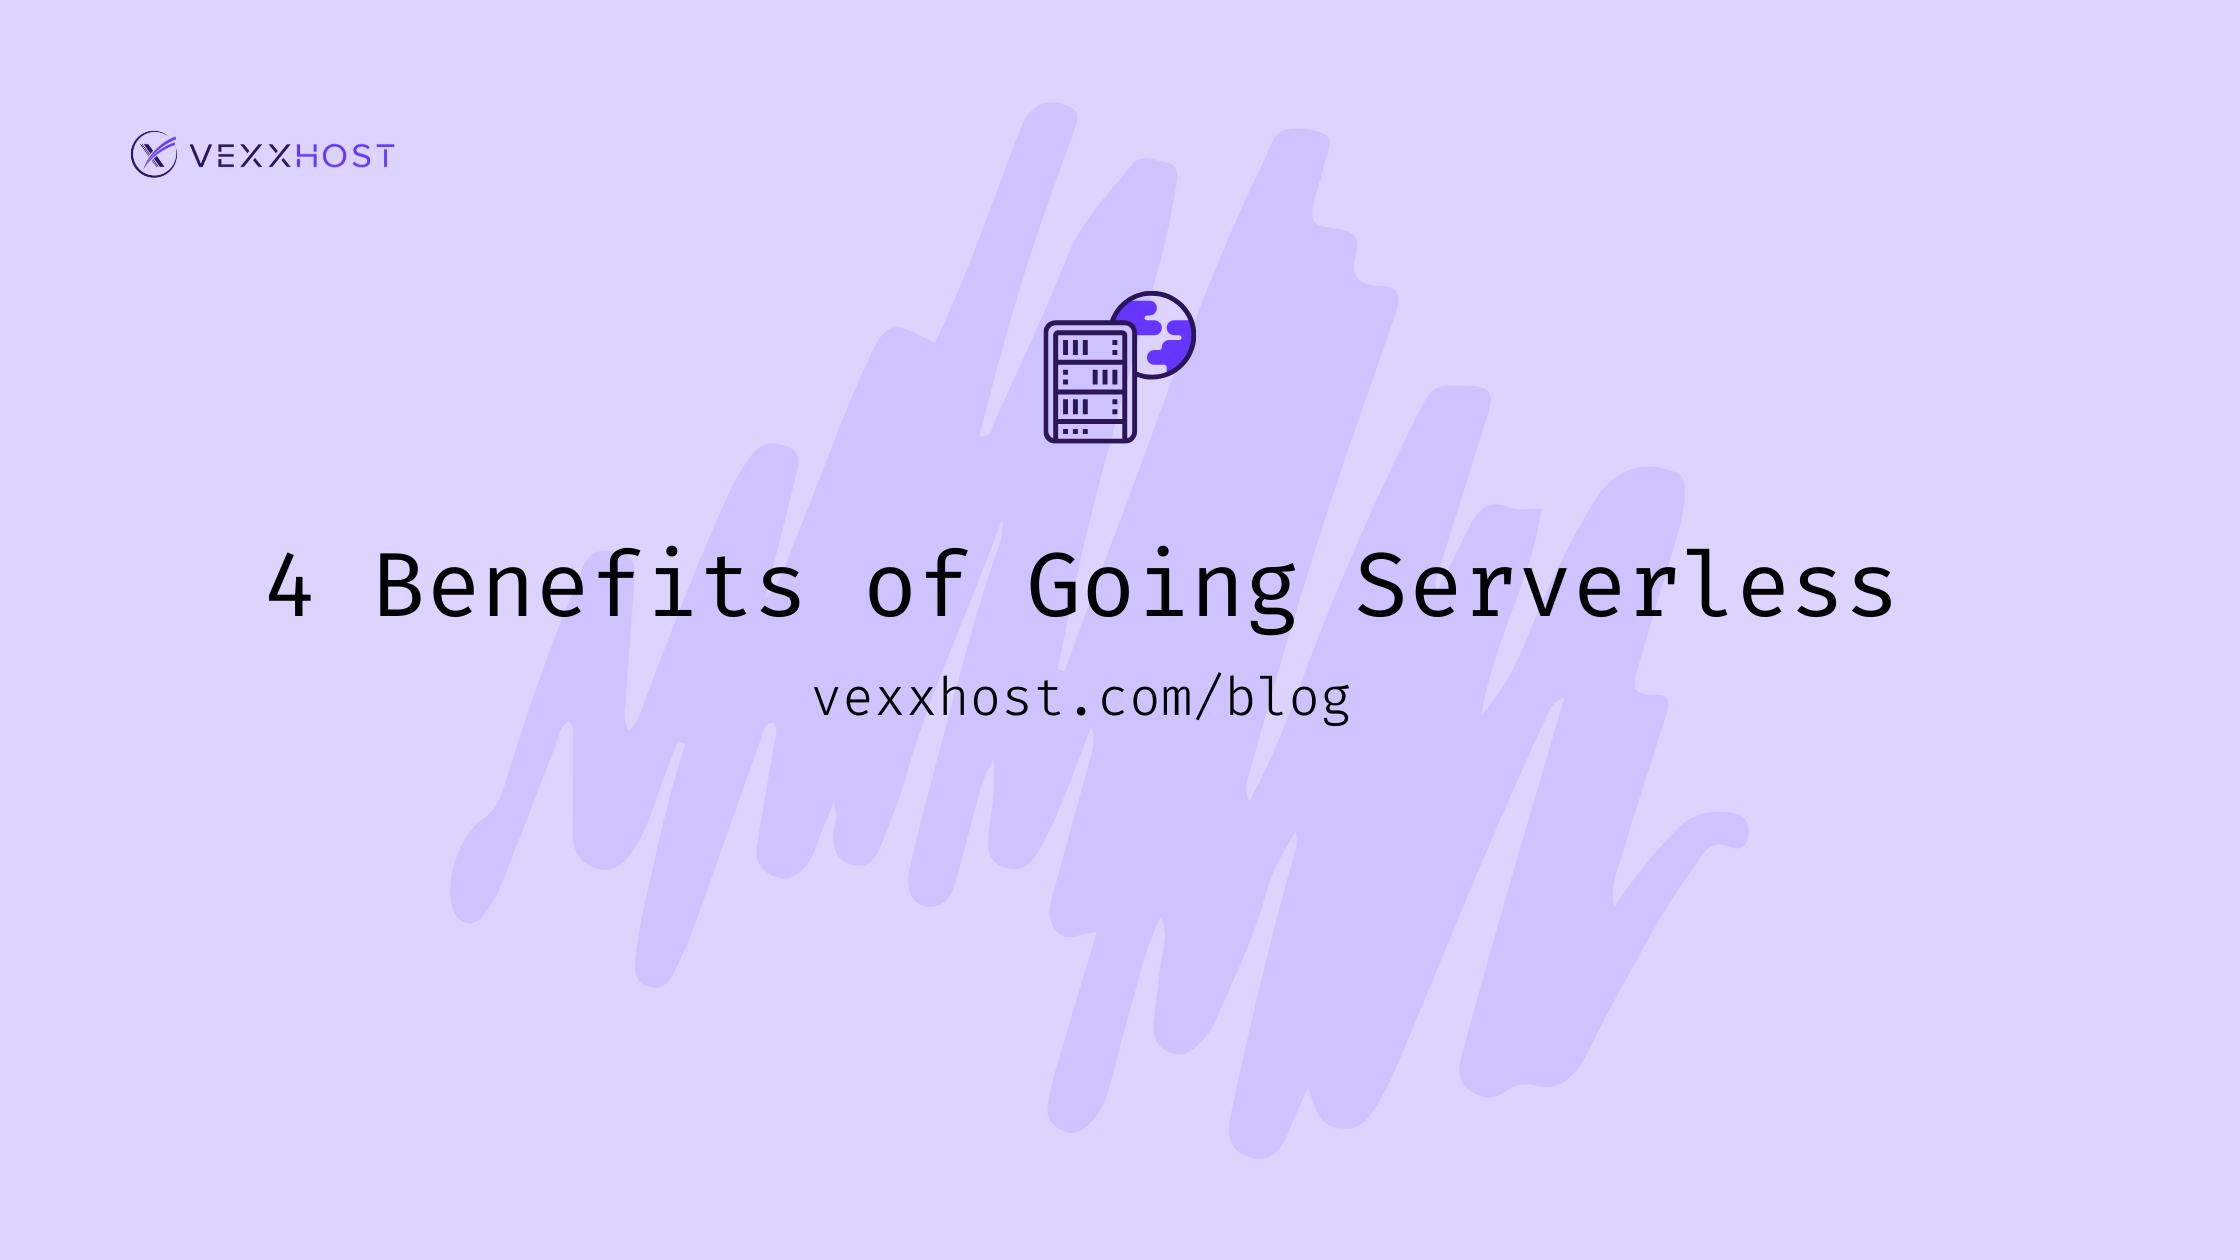 4 Benefits of Going Serverless